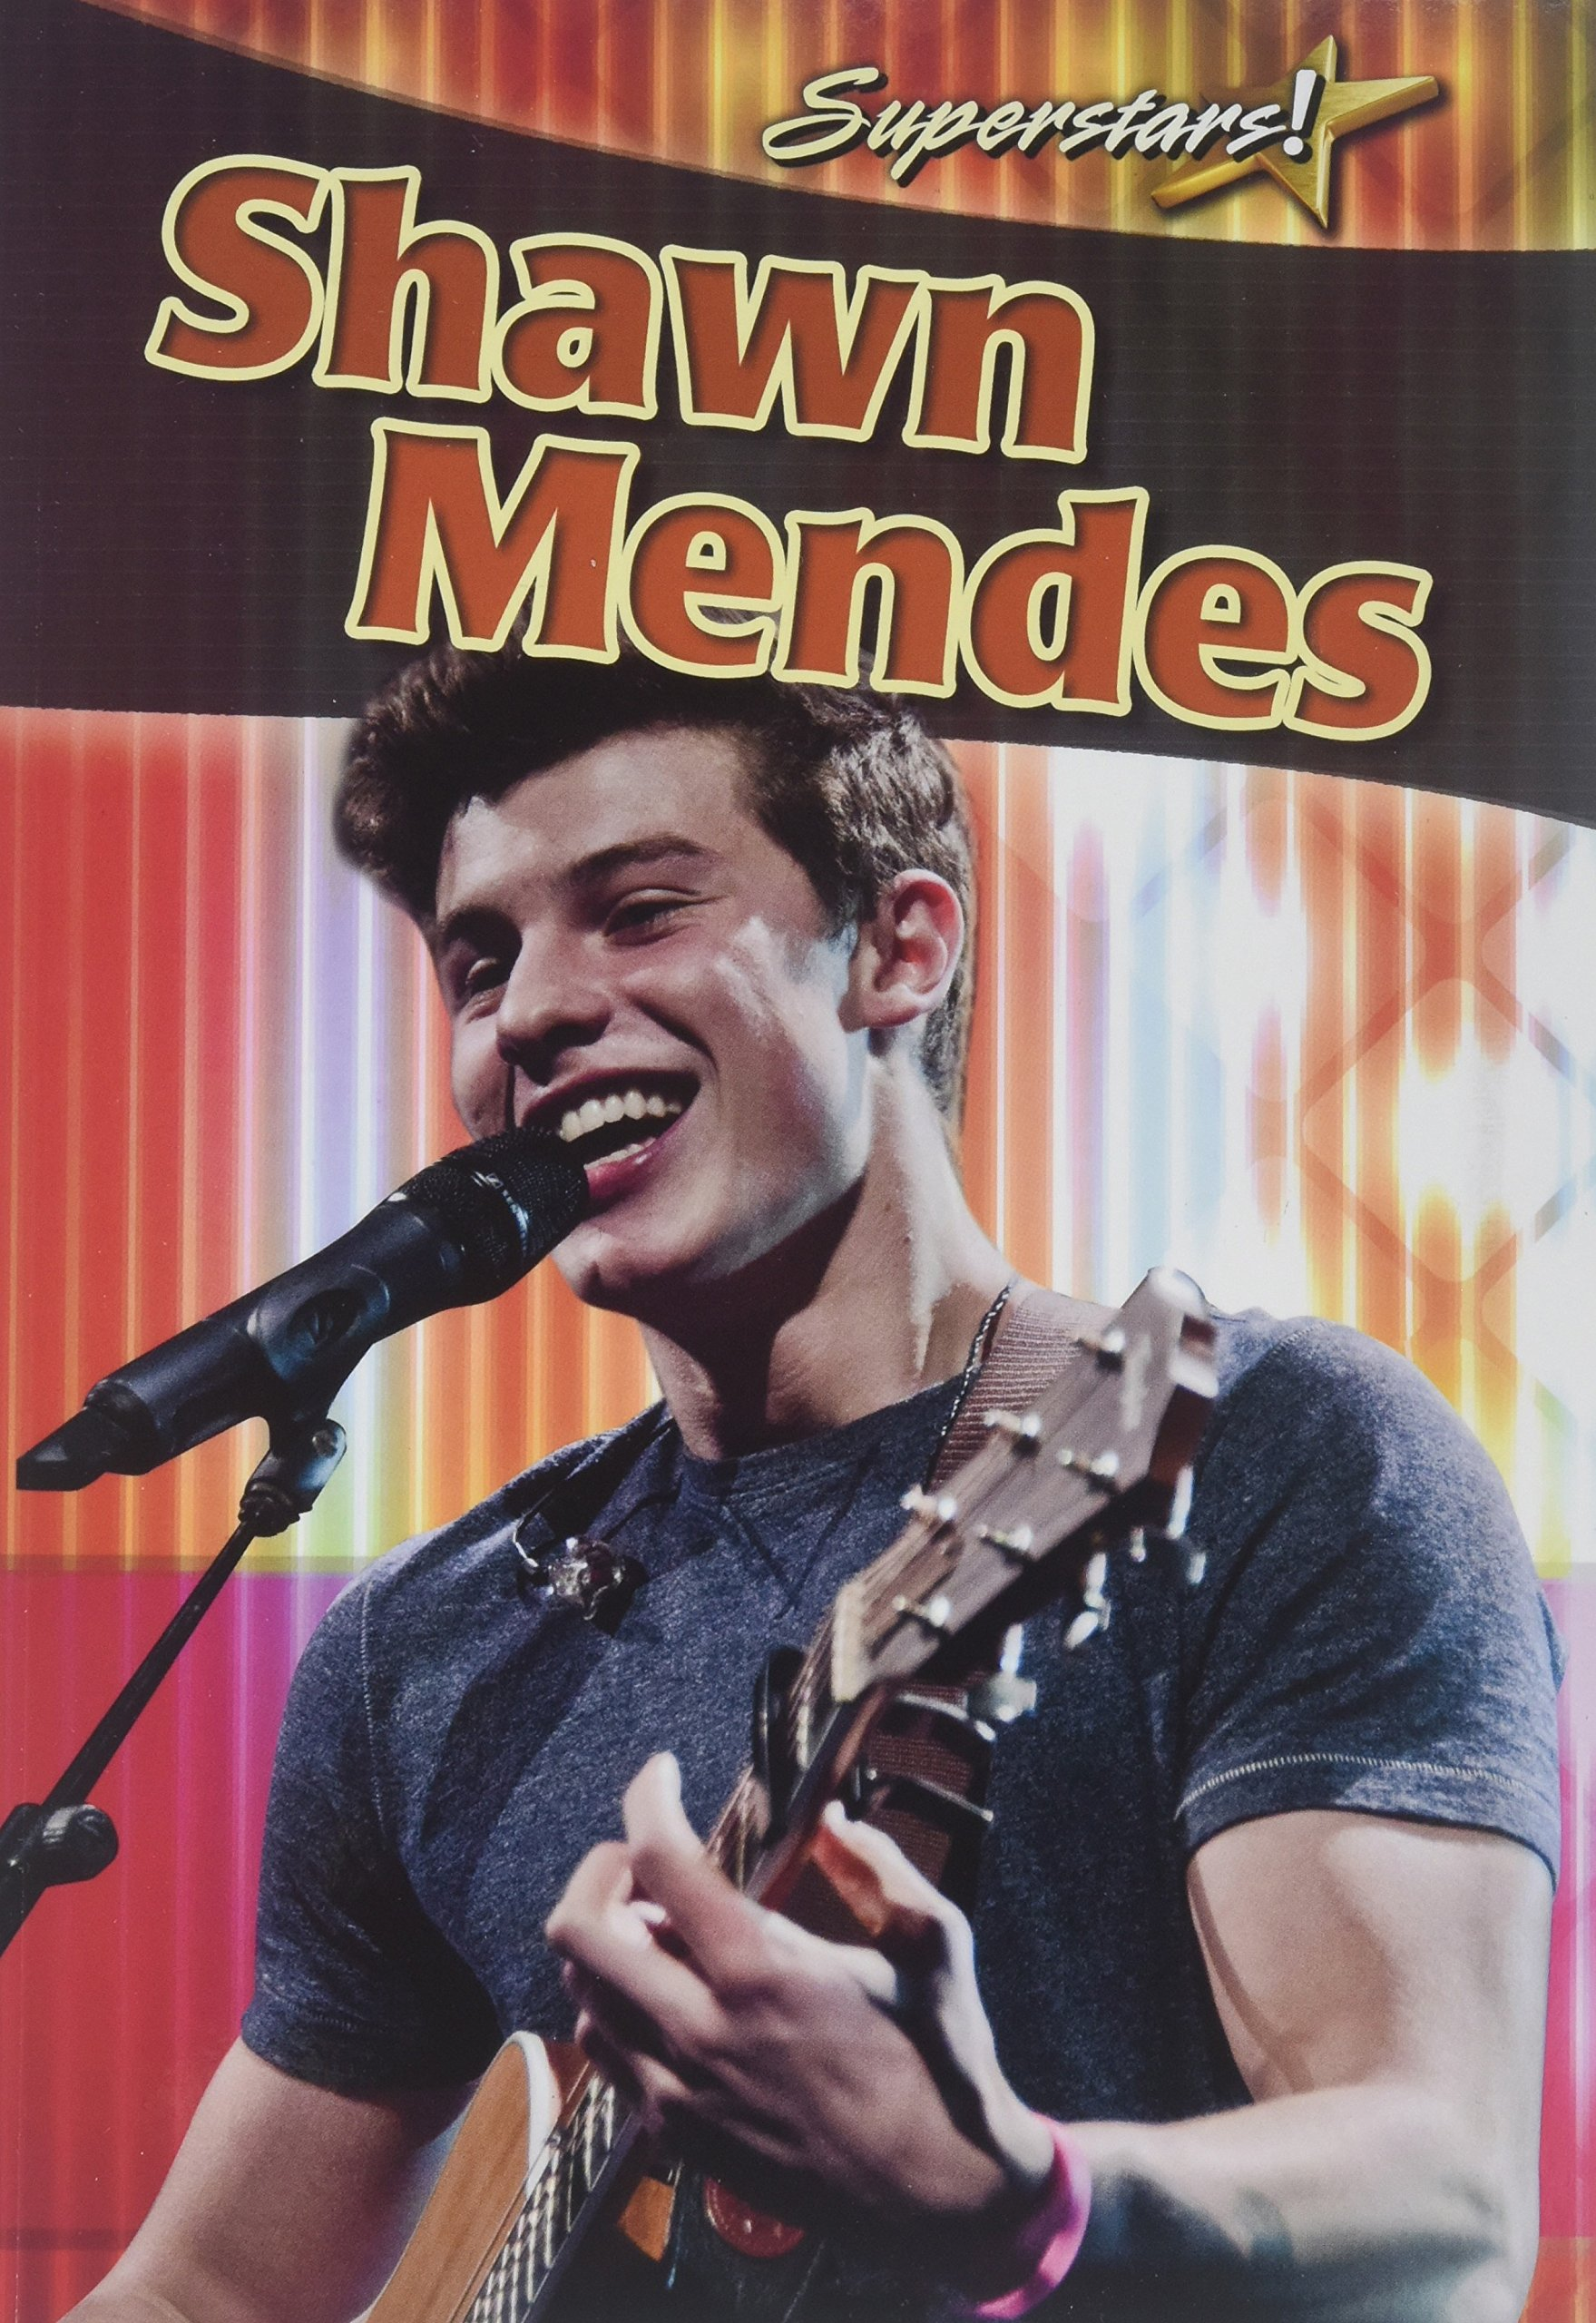 Shawn Mendes (Superstars!)